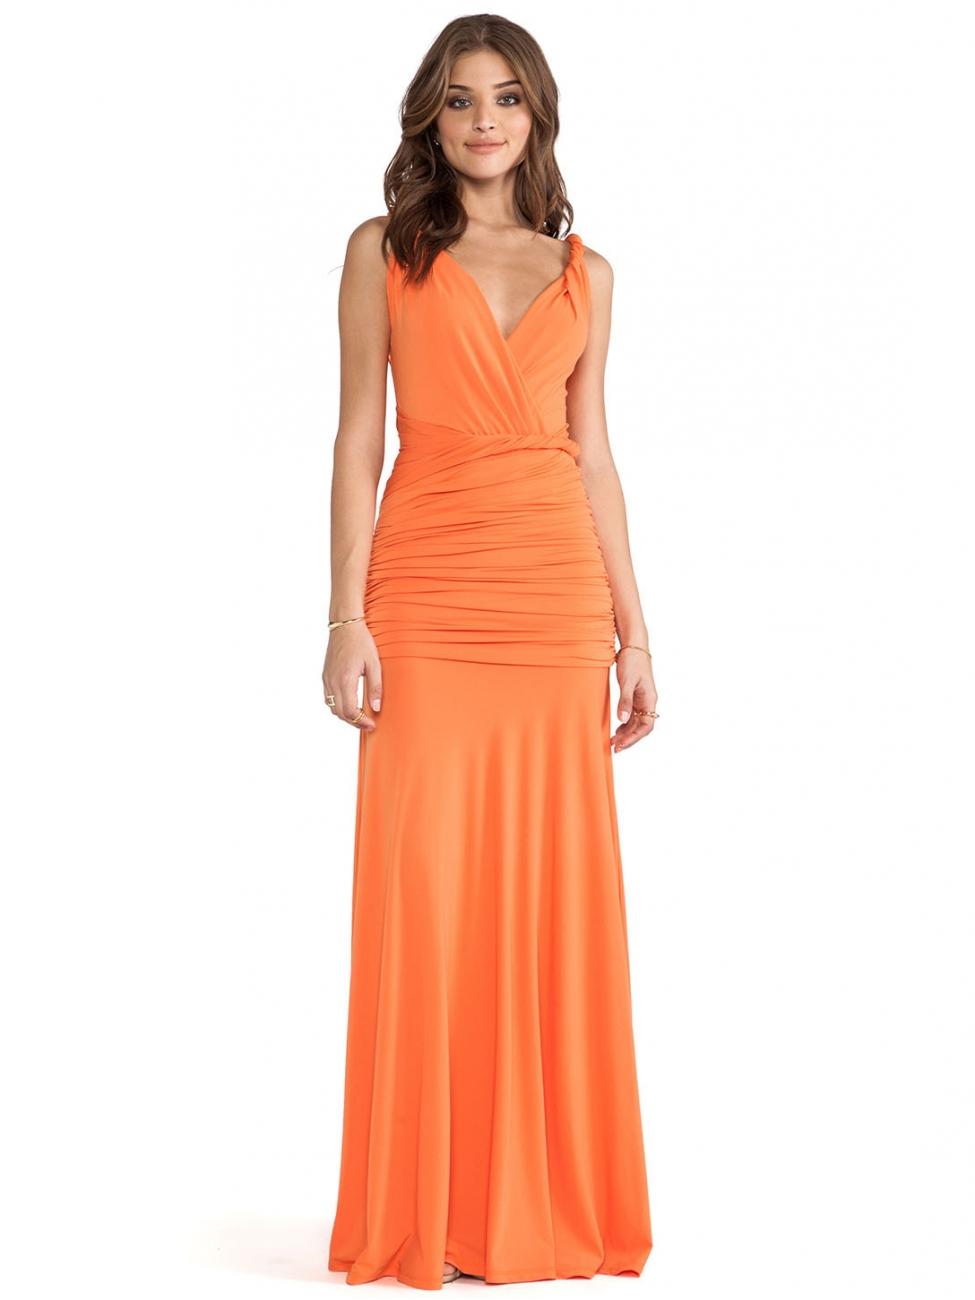 5abc9396728 Louise Paris - HALSTON HERITAGE Tangerine sleeveless draped jersey gown  Size 36